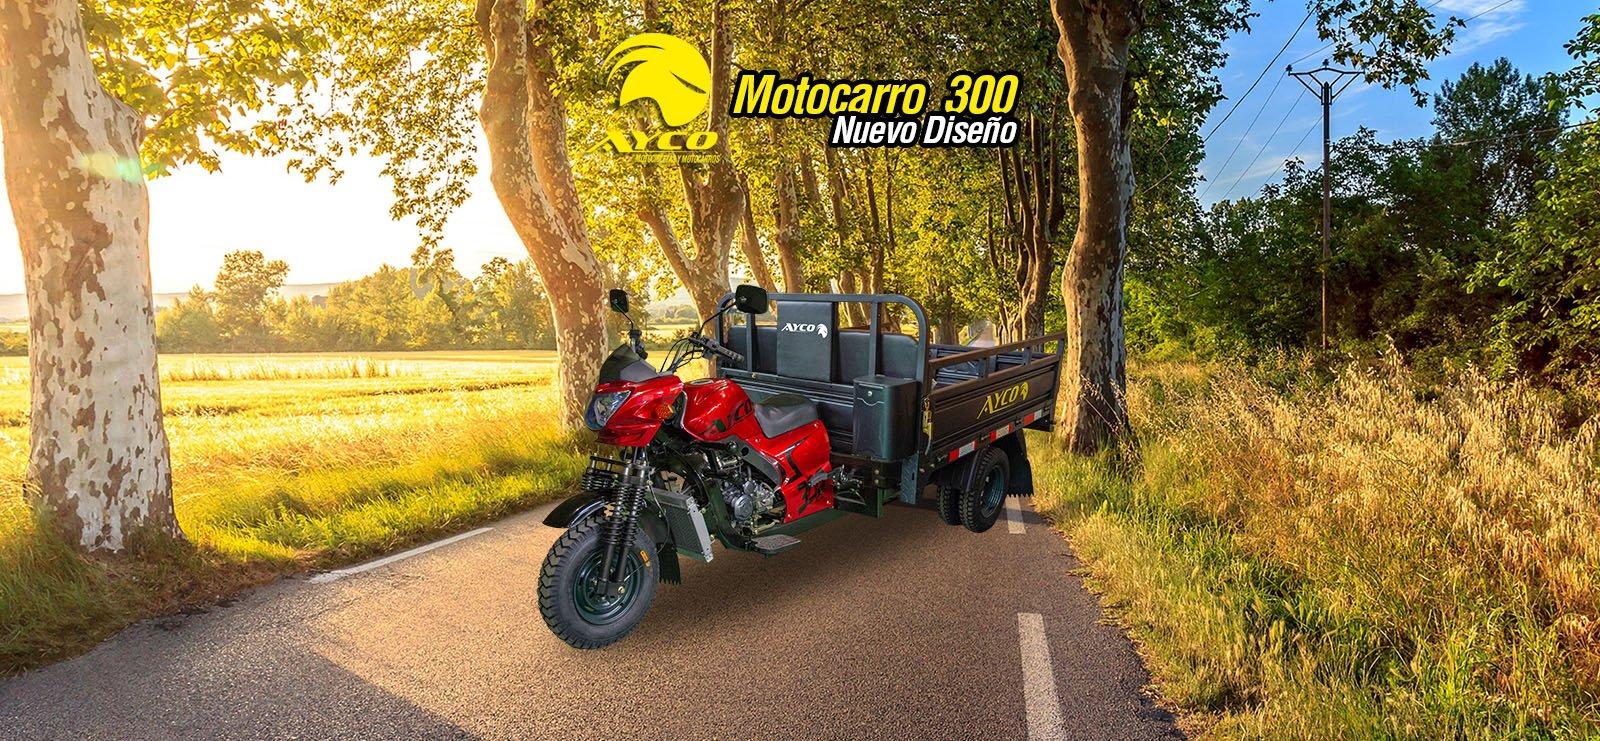 motocarro ayco 300 volqueta transporte carga